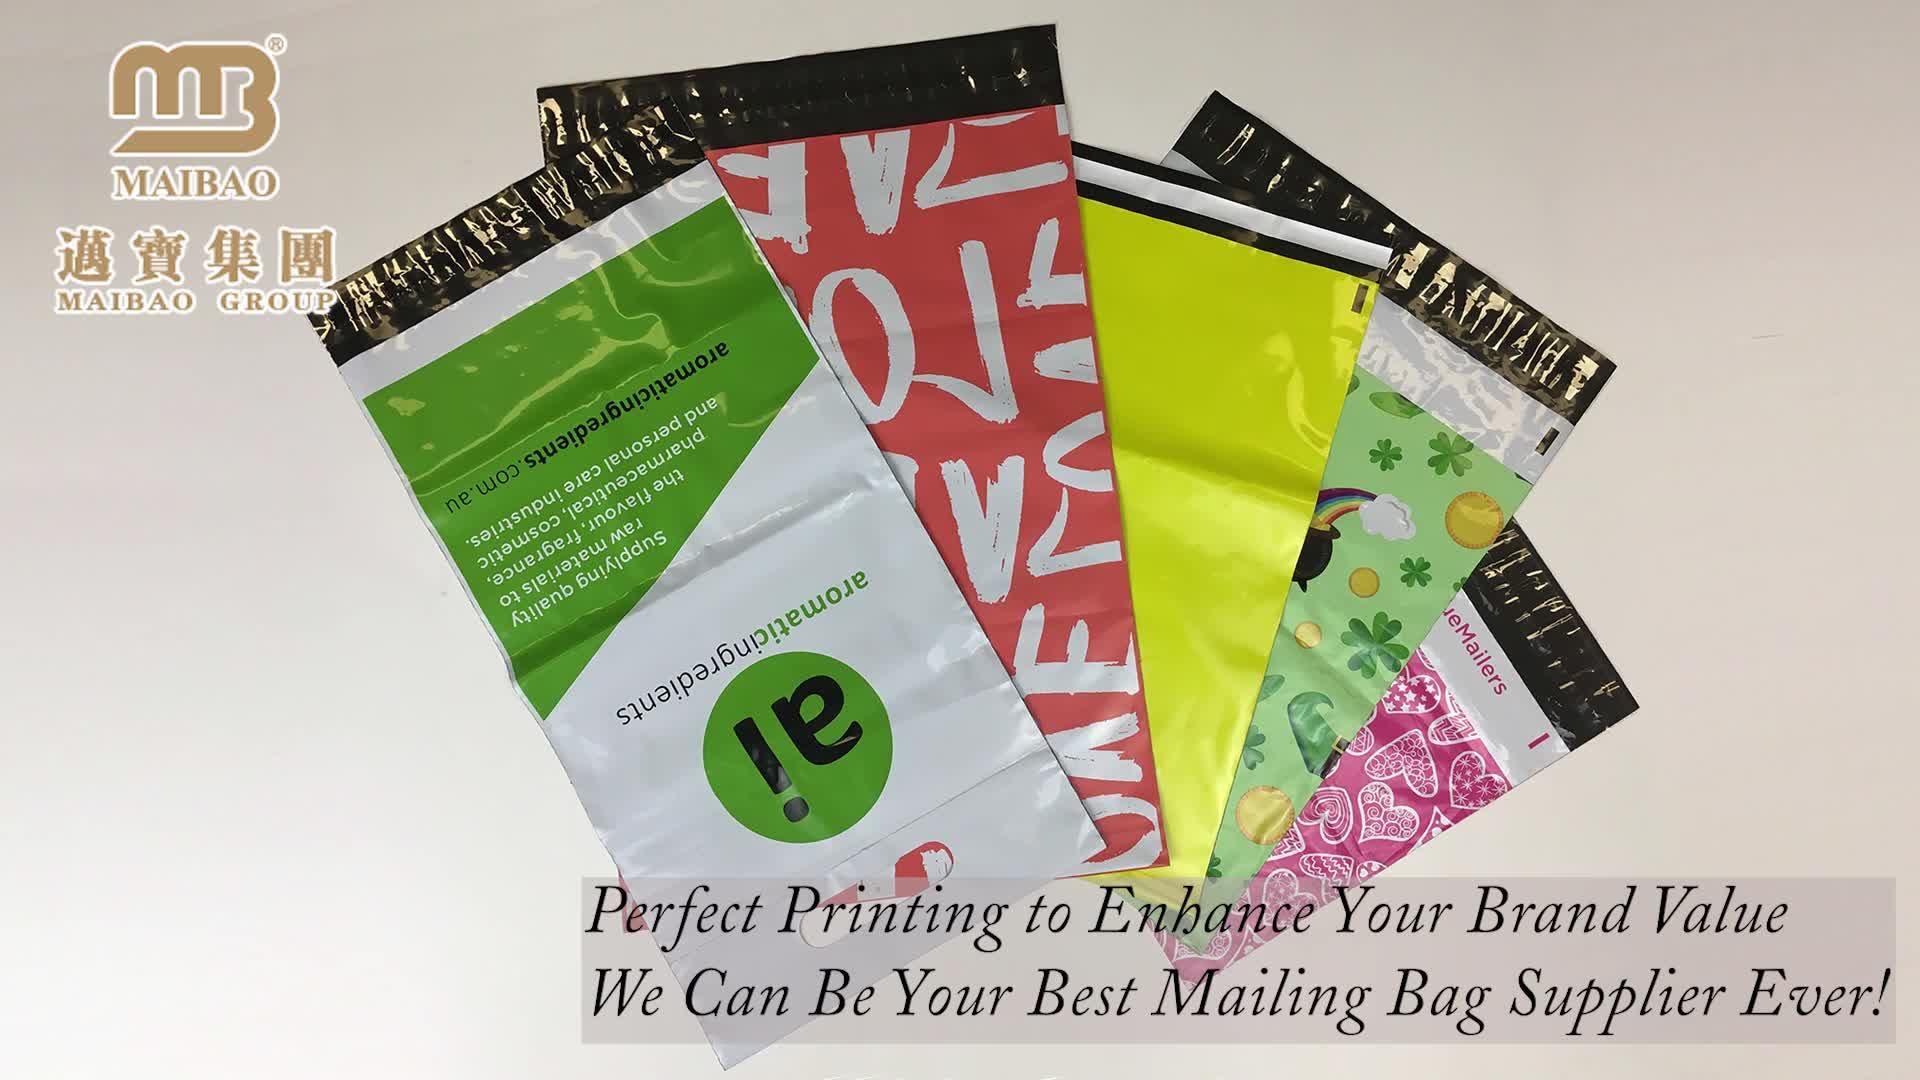 Biodegradable खाद बैंक जमा सुरक्षा पैसे बारकोड के साथ छेड़छाड़ सबूत कूरियर मेलर बैग